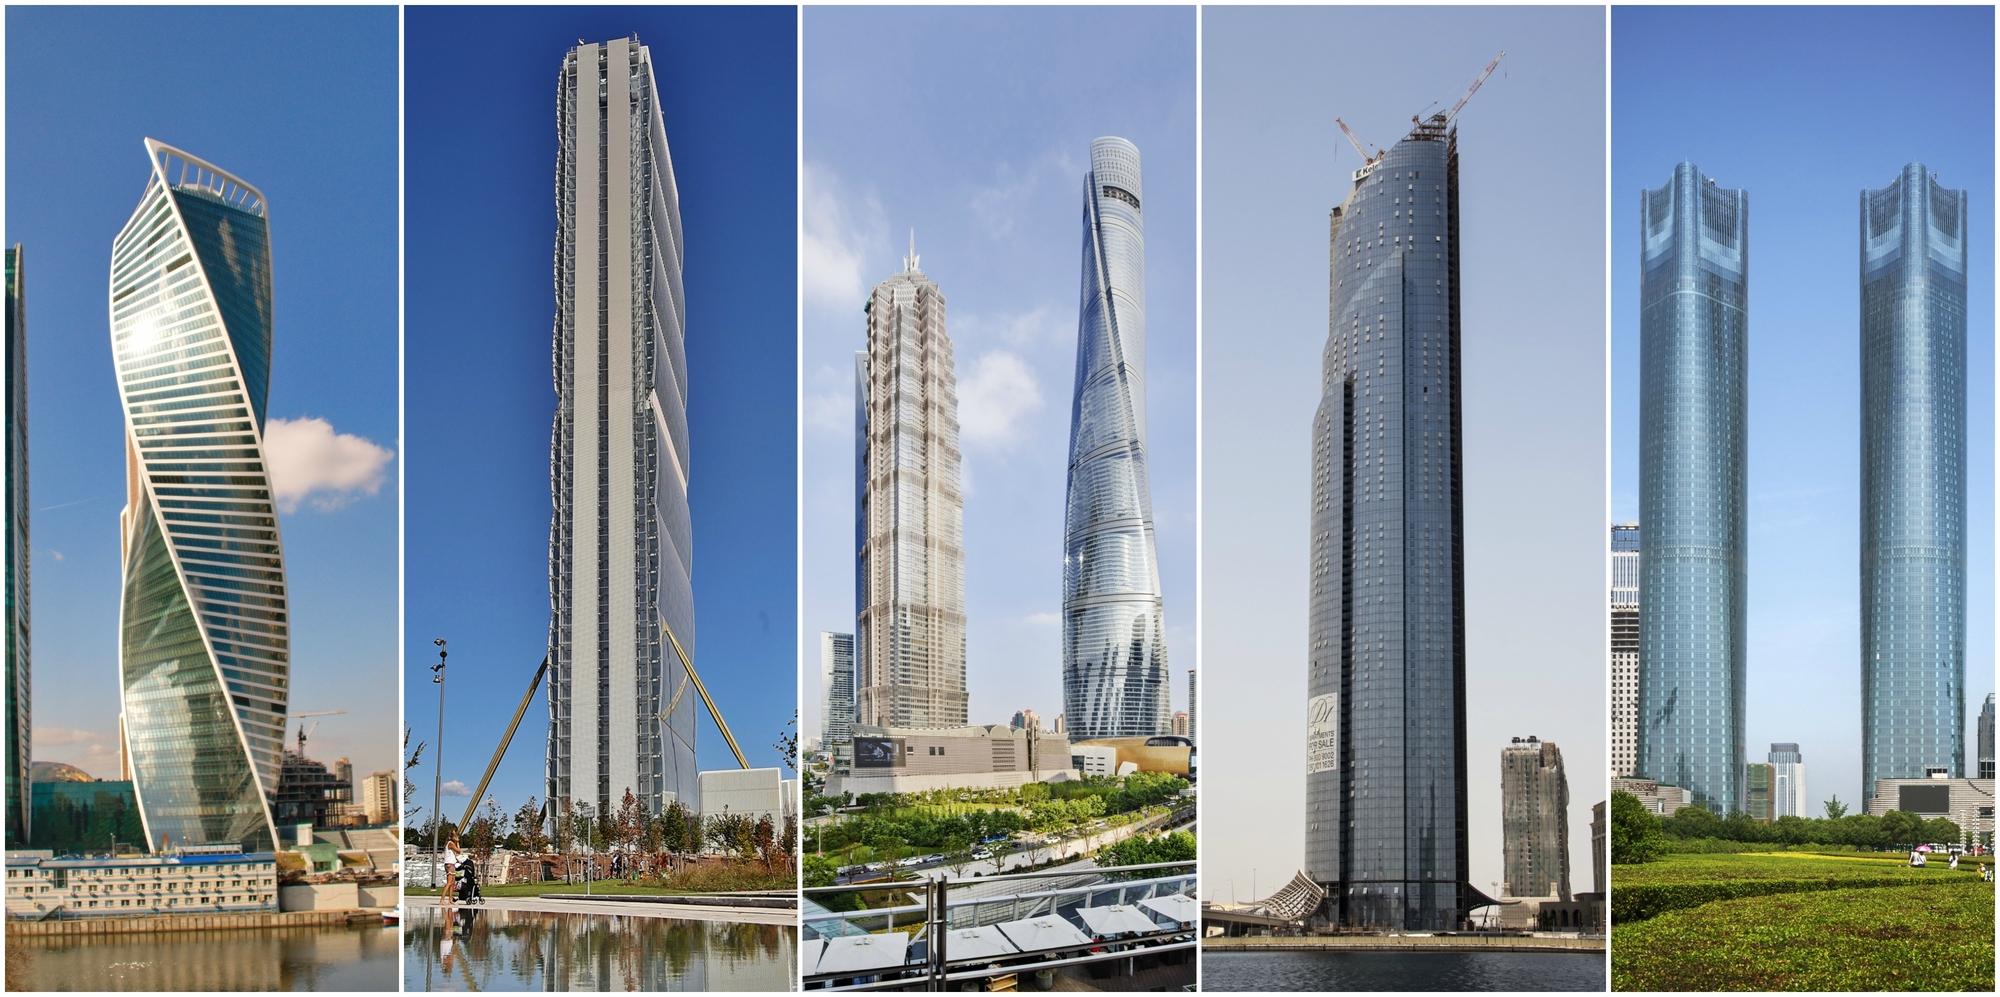 Burj Khalifa Height >> Shanghai Tower Wins 2015 Emporis Skyscraper Award | ArchDaily